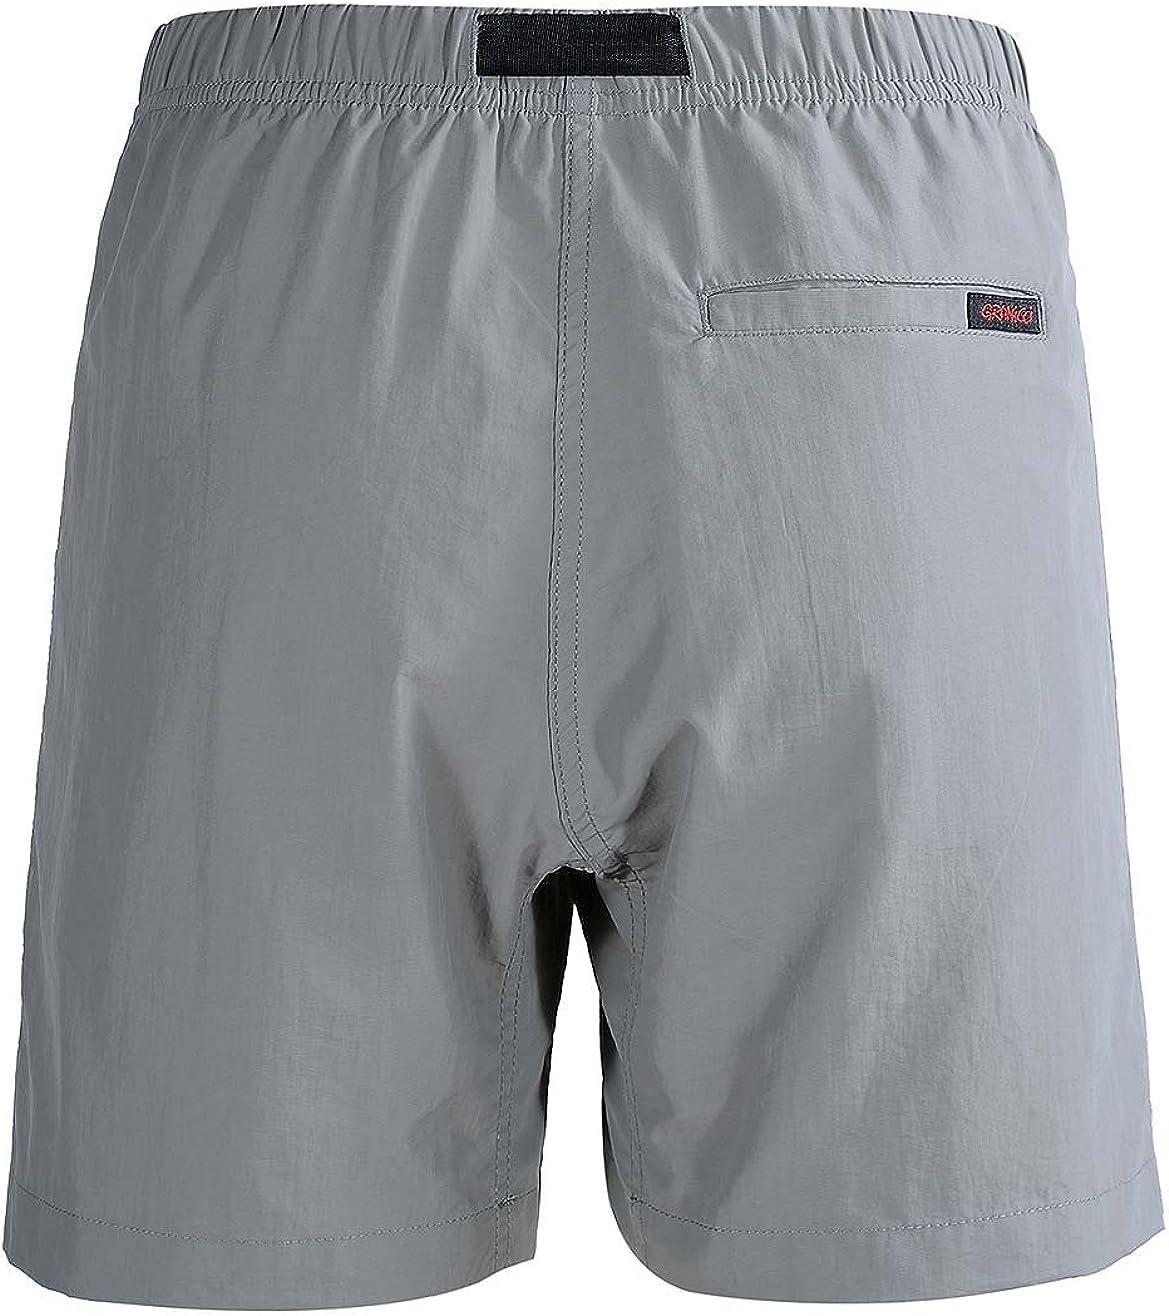 Gramicci Womens Rocket Dry G Shorts